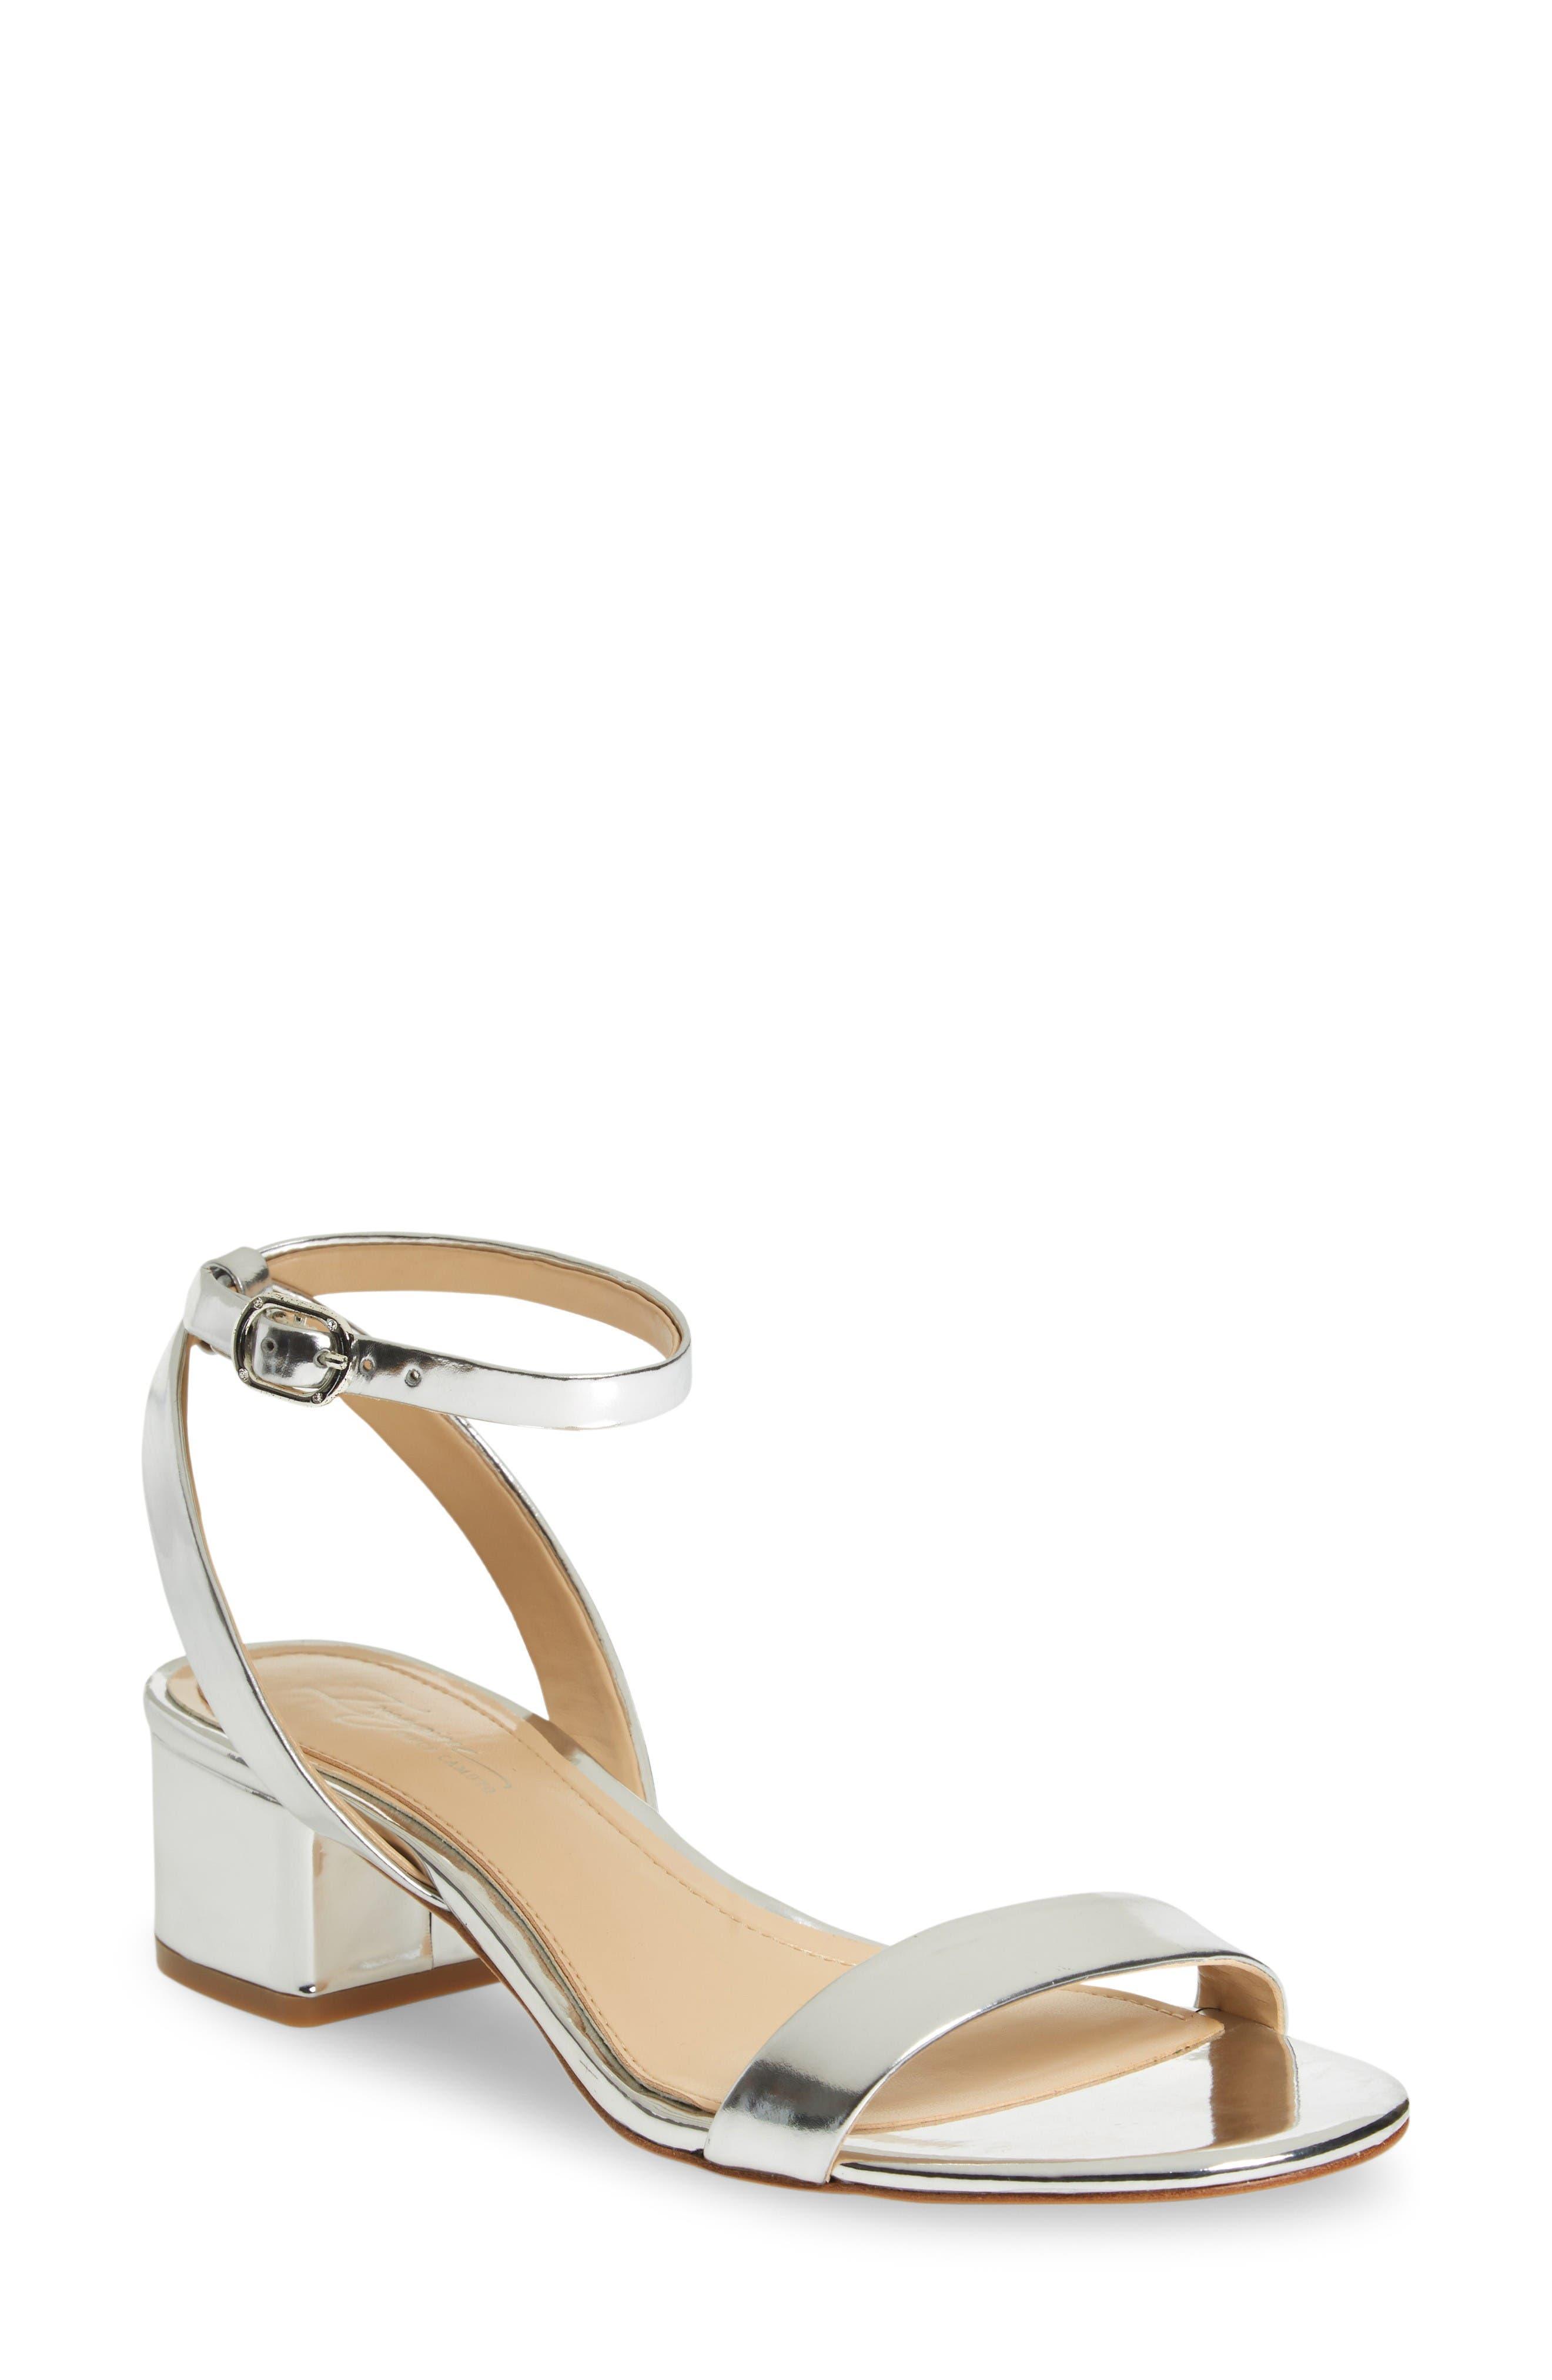 Imagine Vince Camuto Bavel Sandal,                         Main,                         color, Platinum Leather